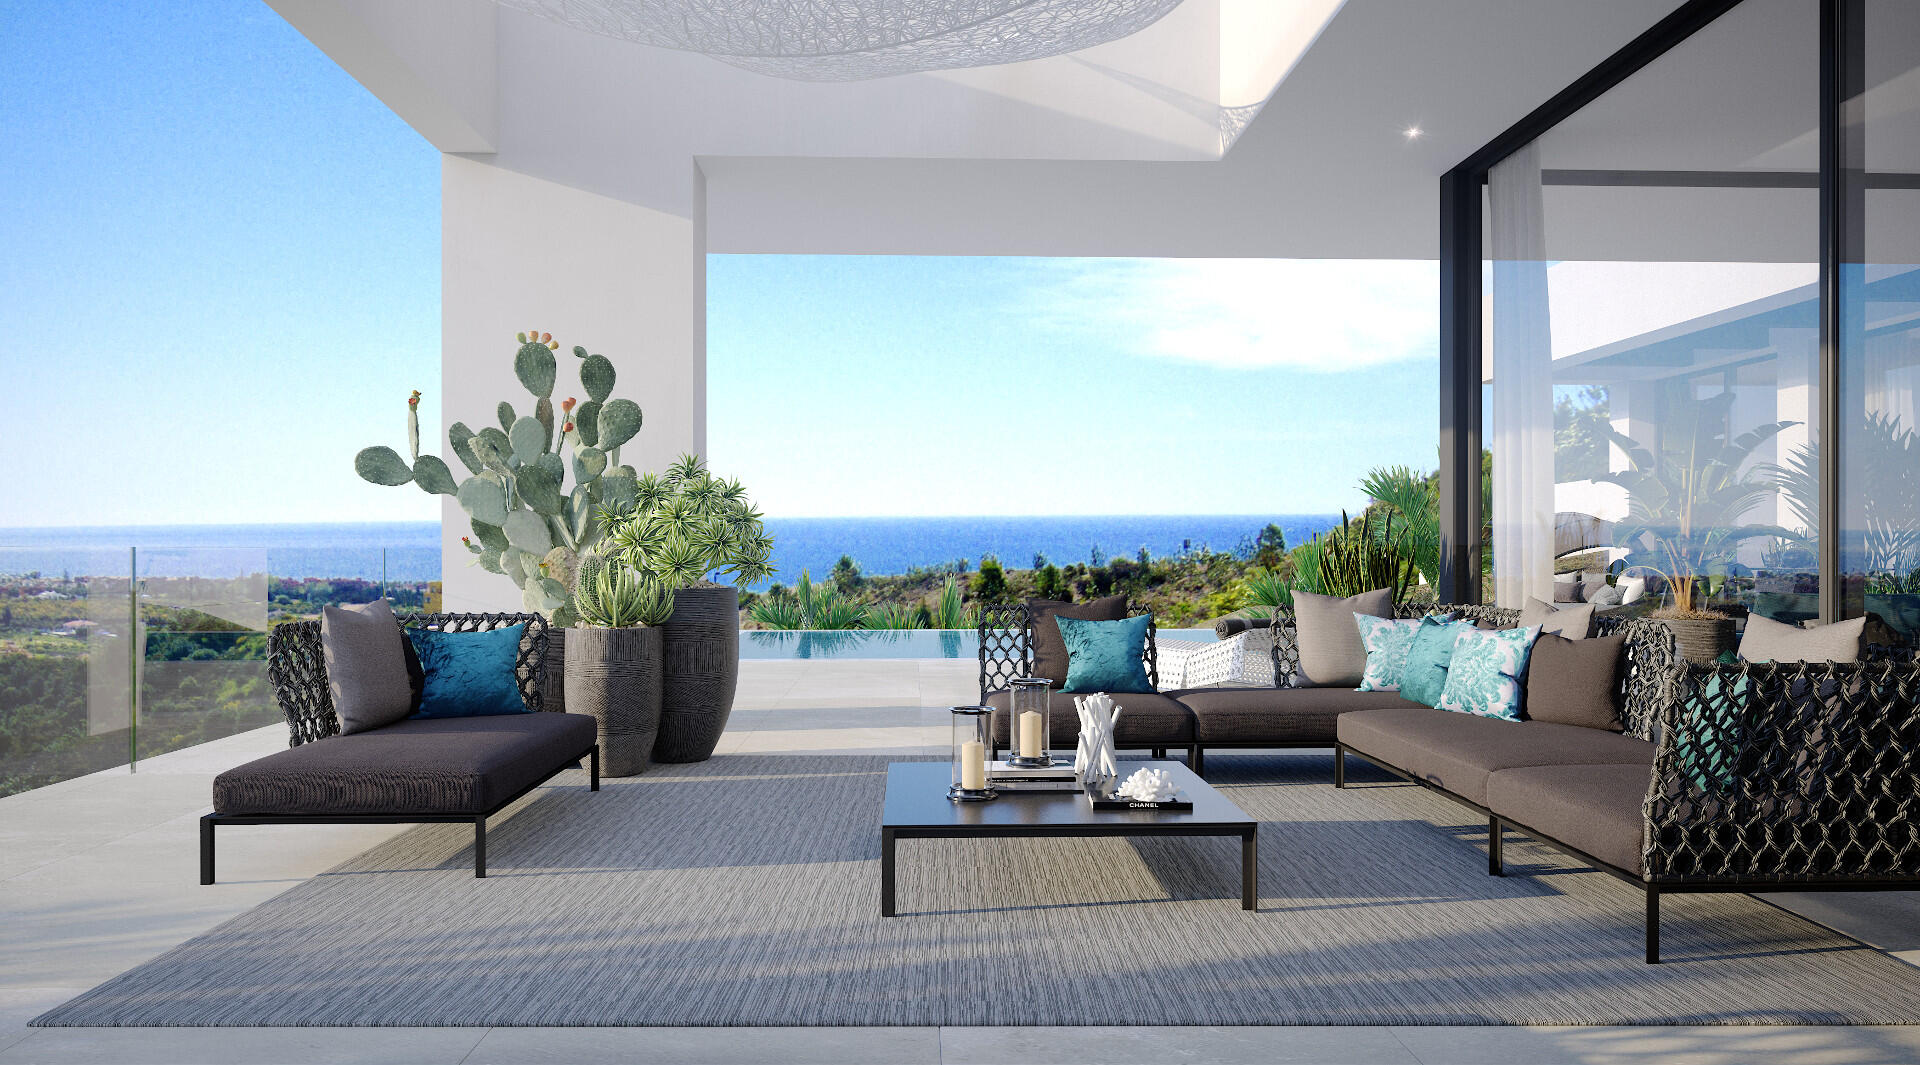 THE VIEW new luxury villas for sale Estepona_Realista Qualtily Real Estate Marbella